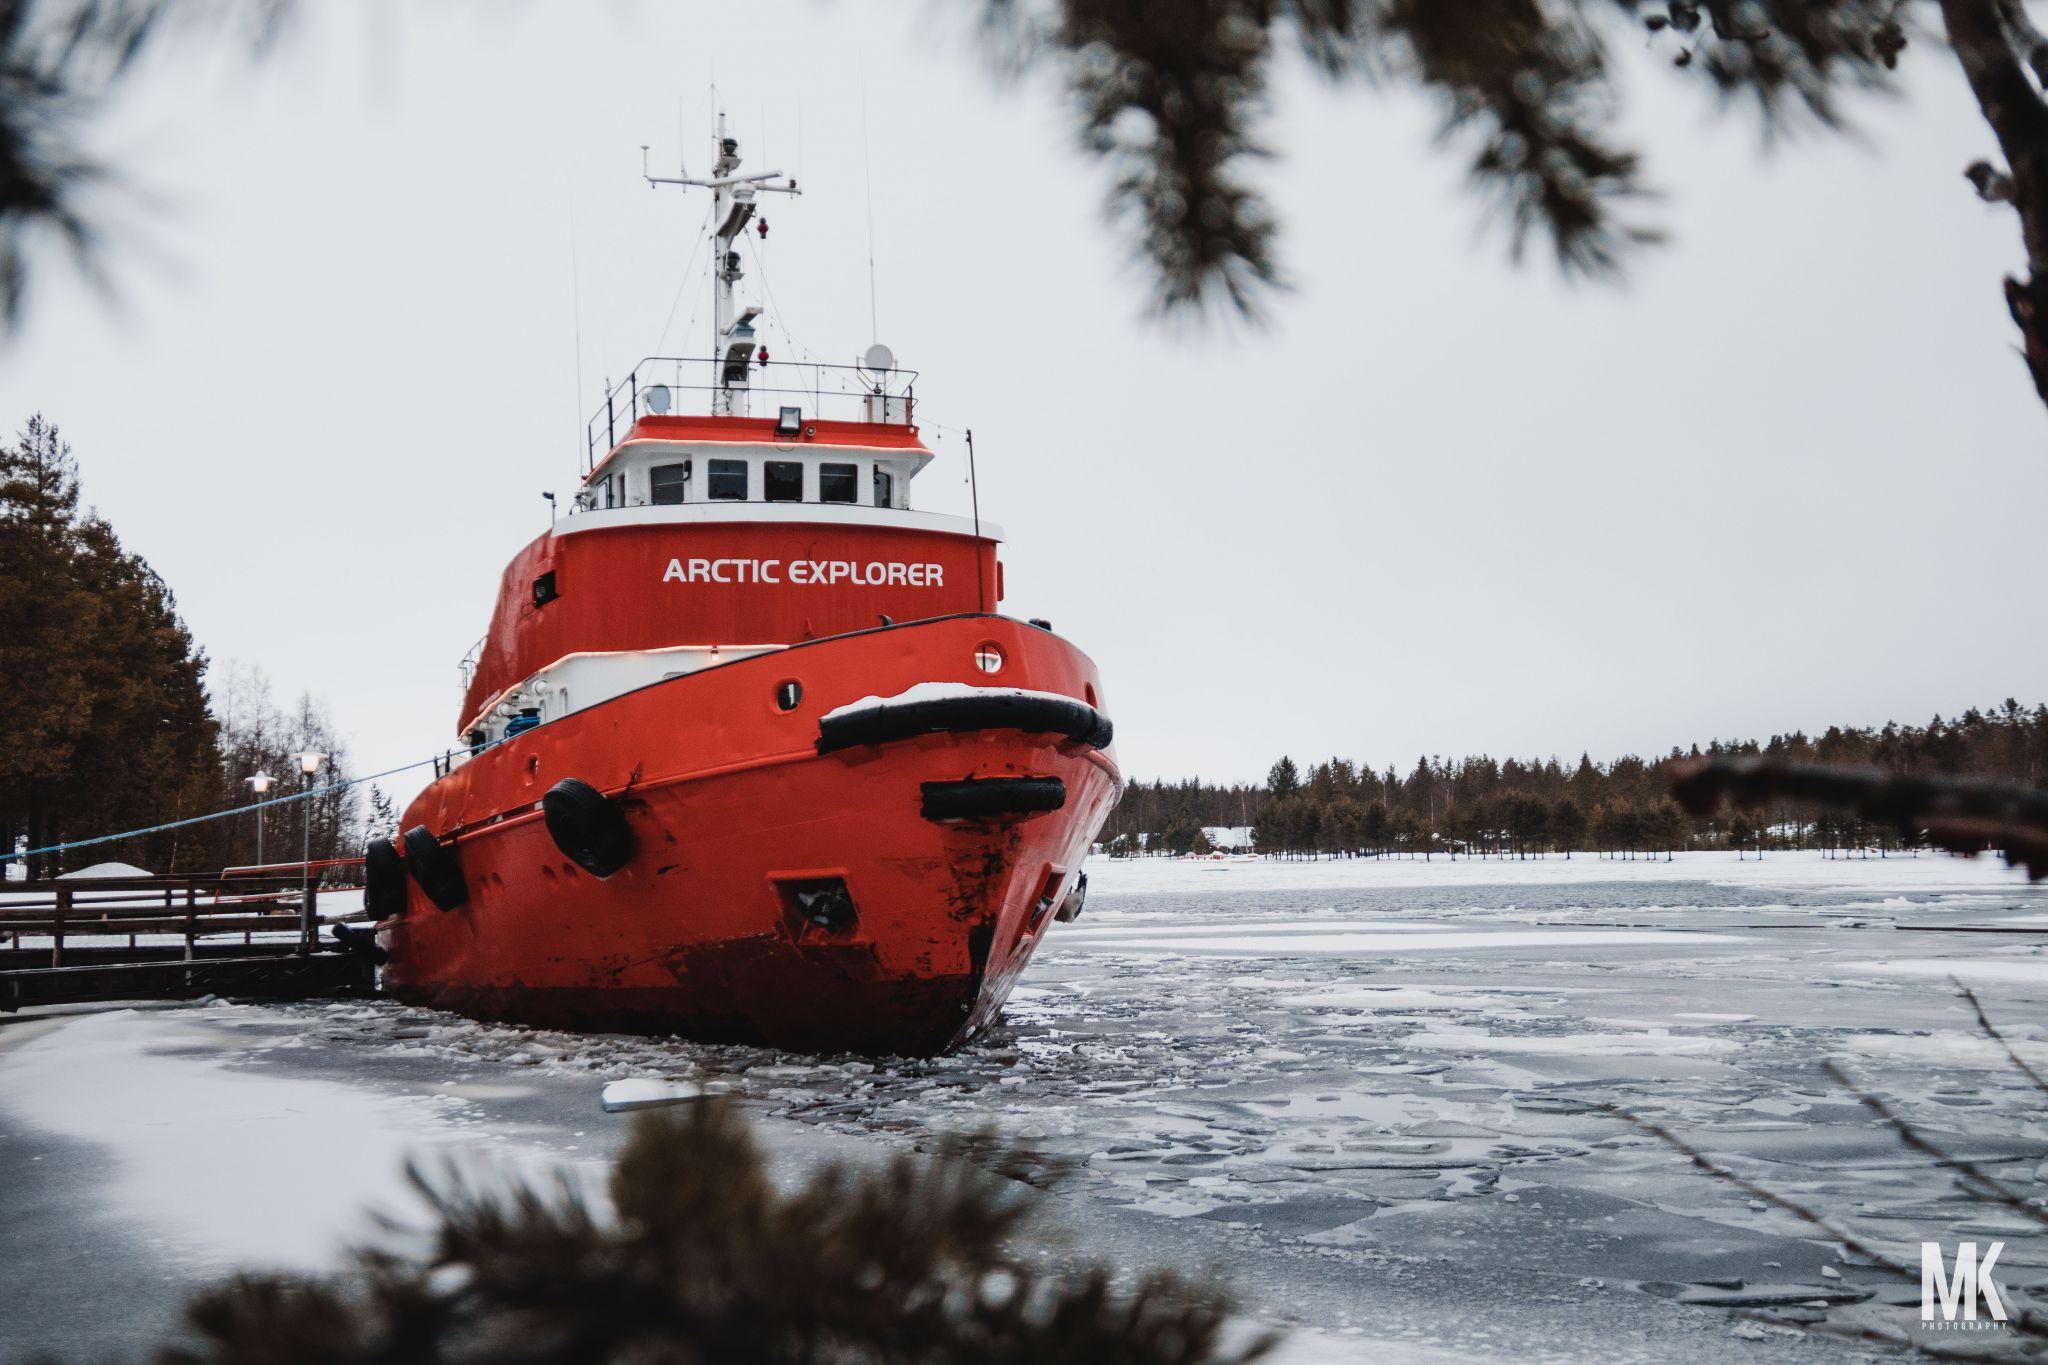 Pitsundsbron norra Icebreaker dock, Piteå Sweden, Sweden